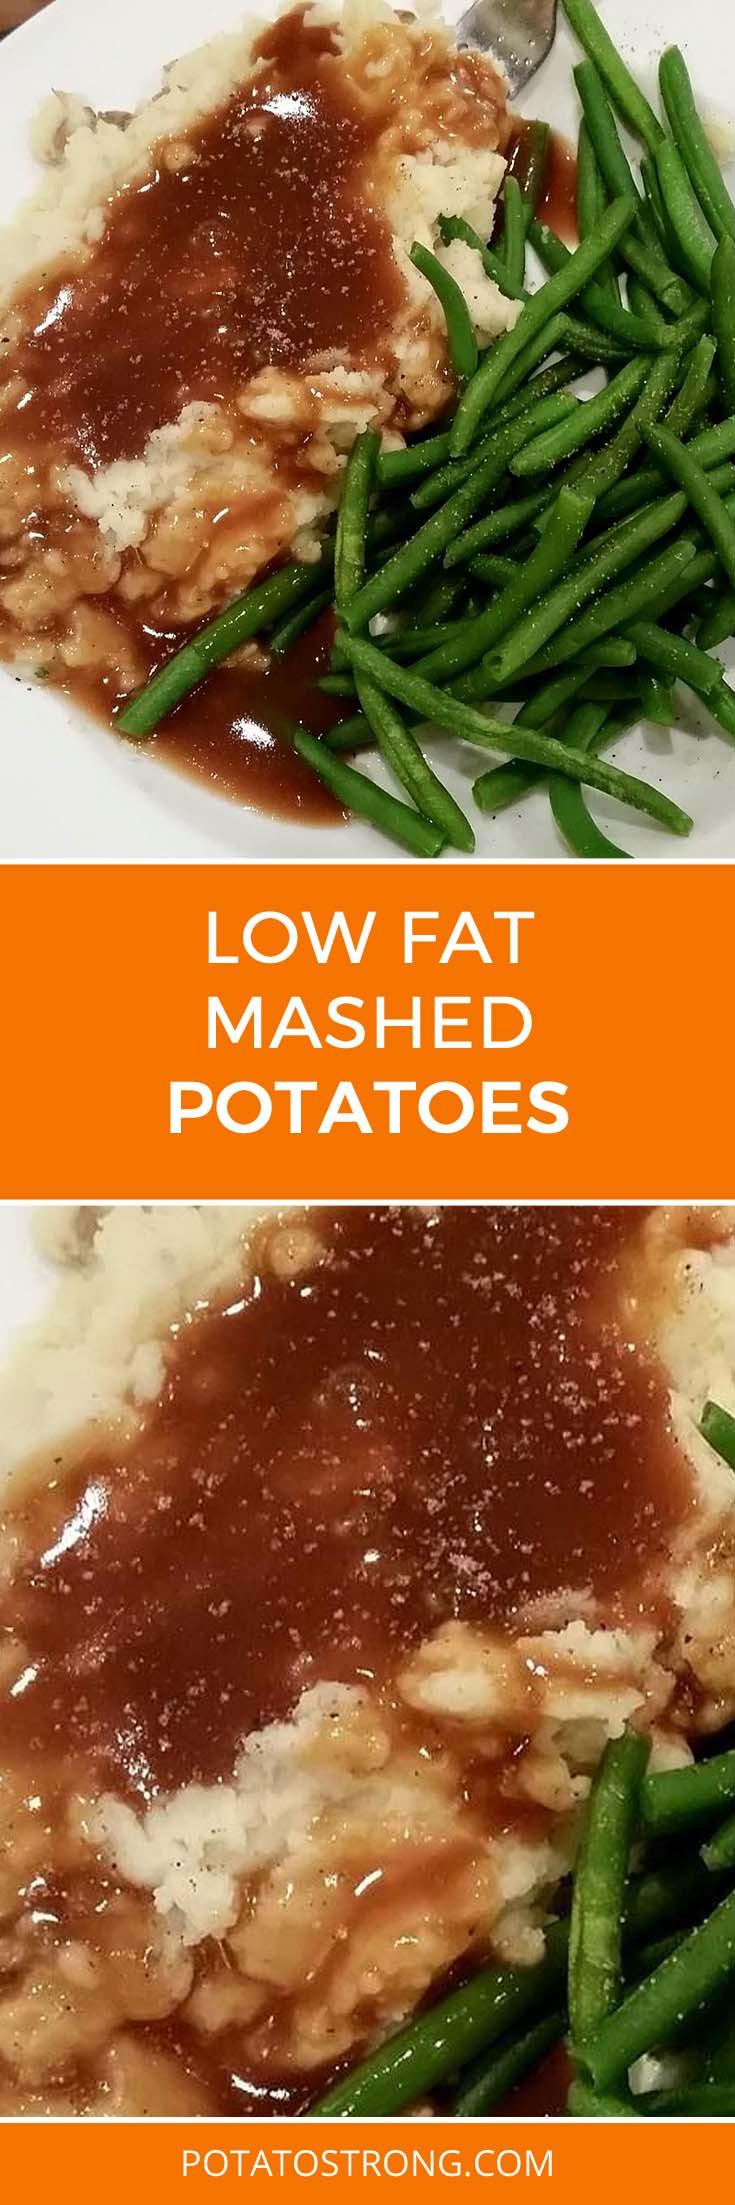 Low Fat Potato Recipes  Low Fat Mashed Potatoes No Milk Butter Needed Potato